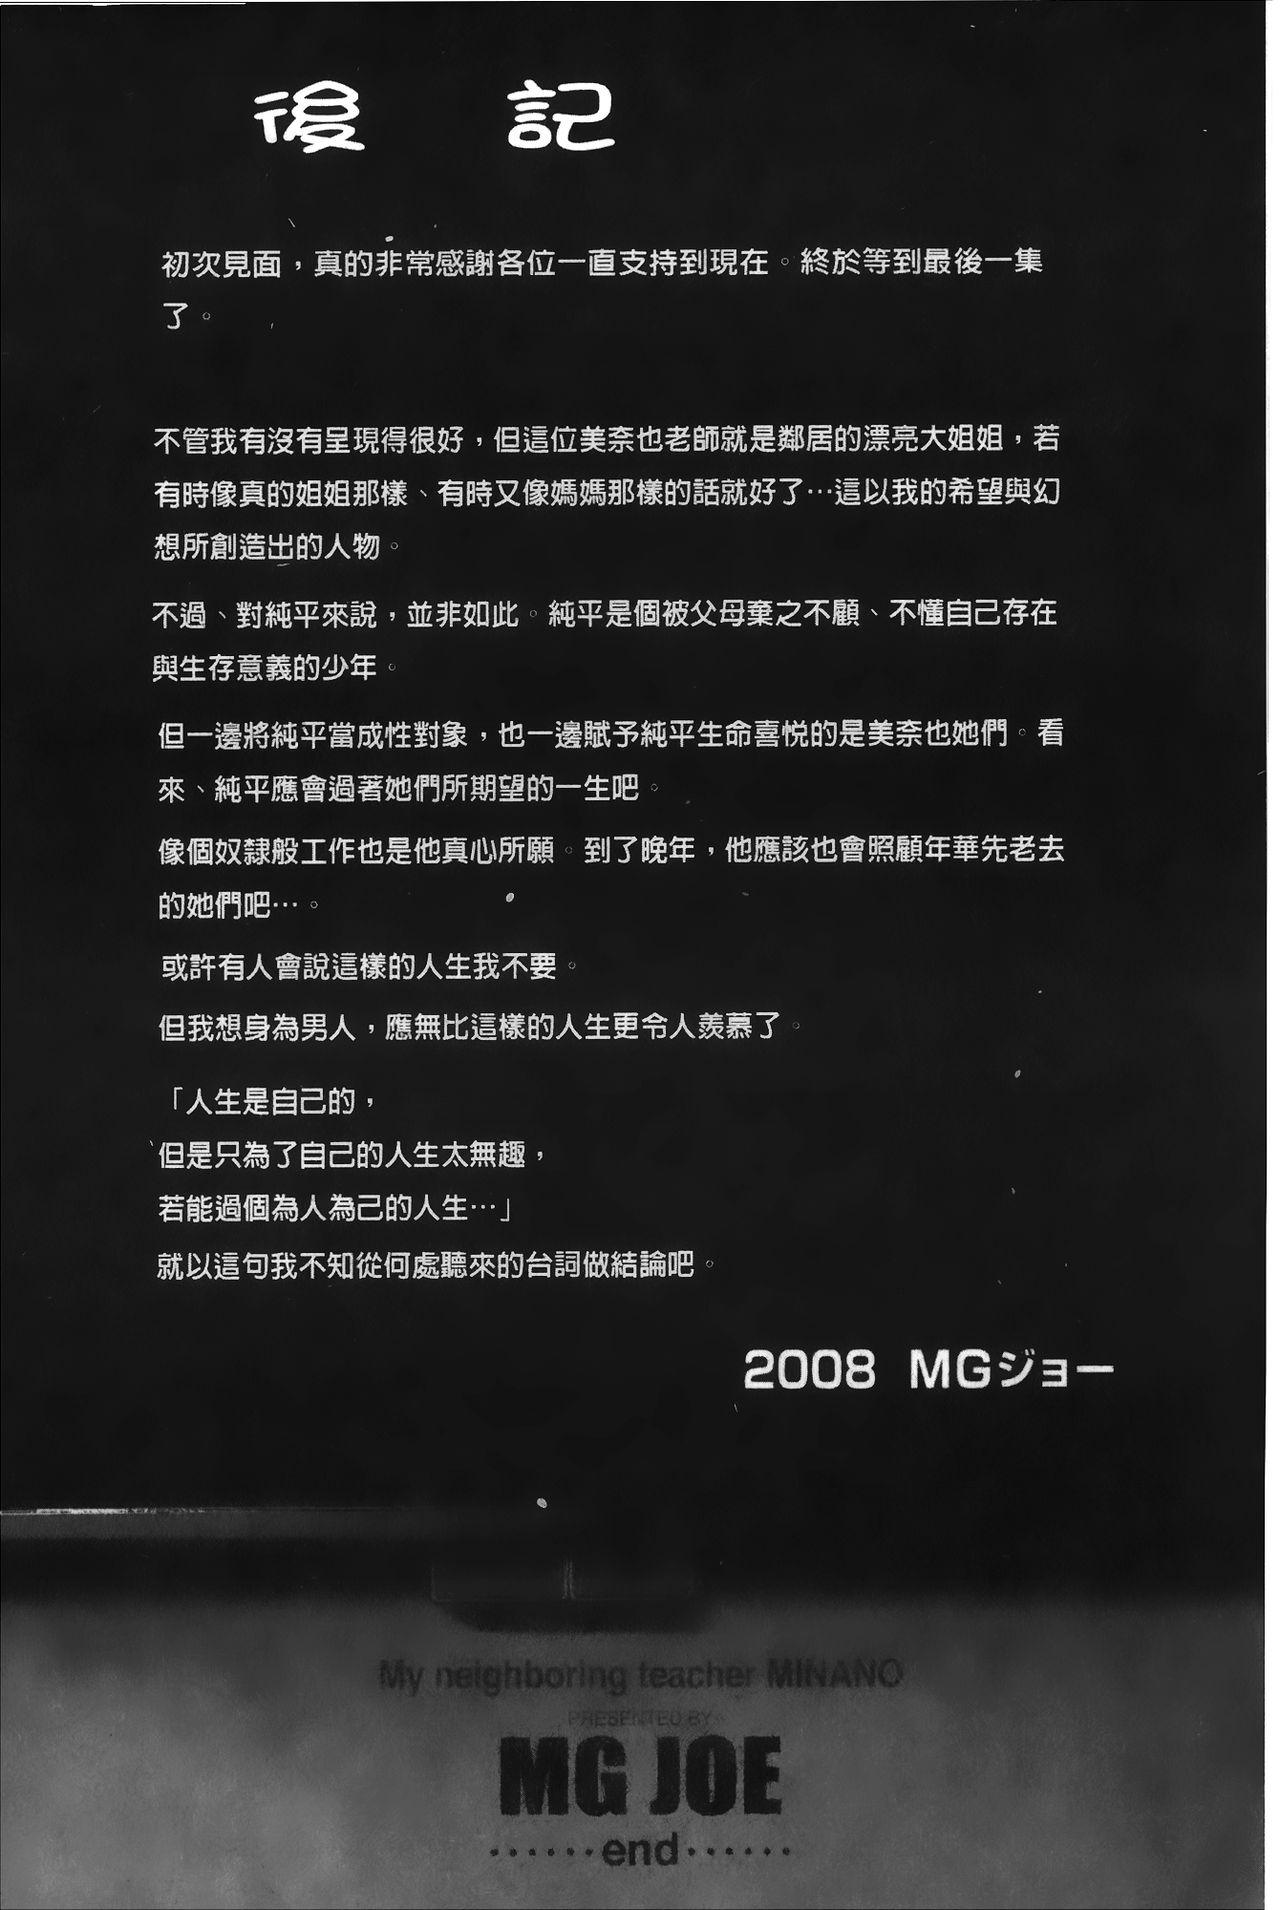 Tonari no Minano Sensei 4 | 隔壁的美奈乃老師 4 222